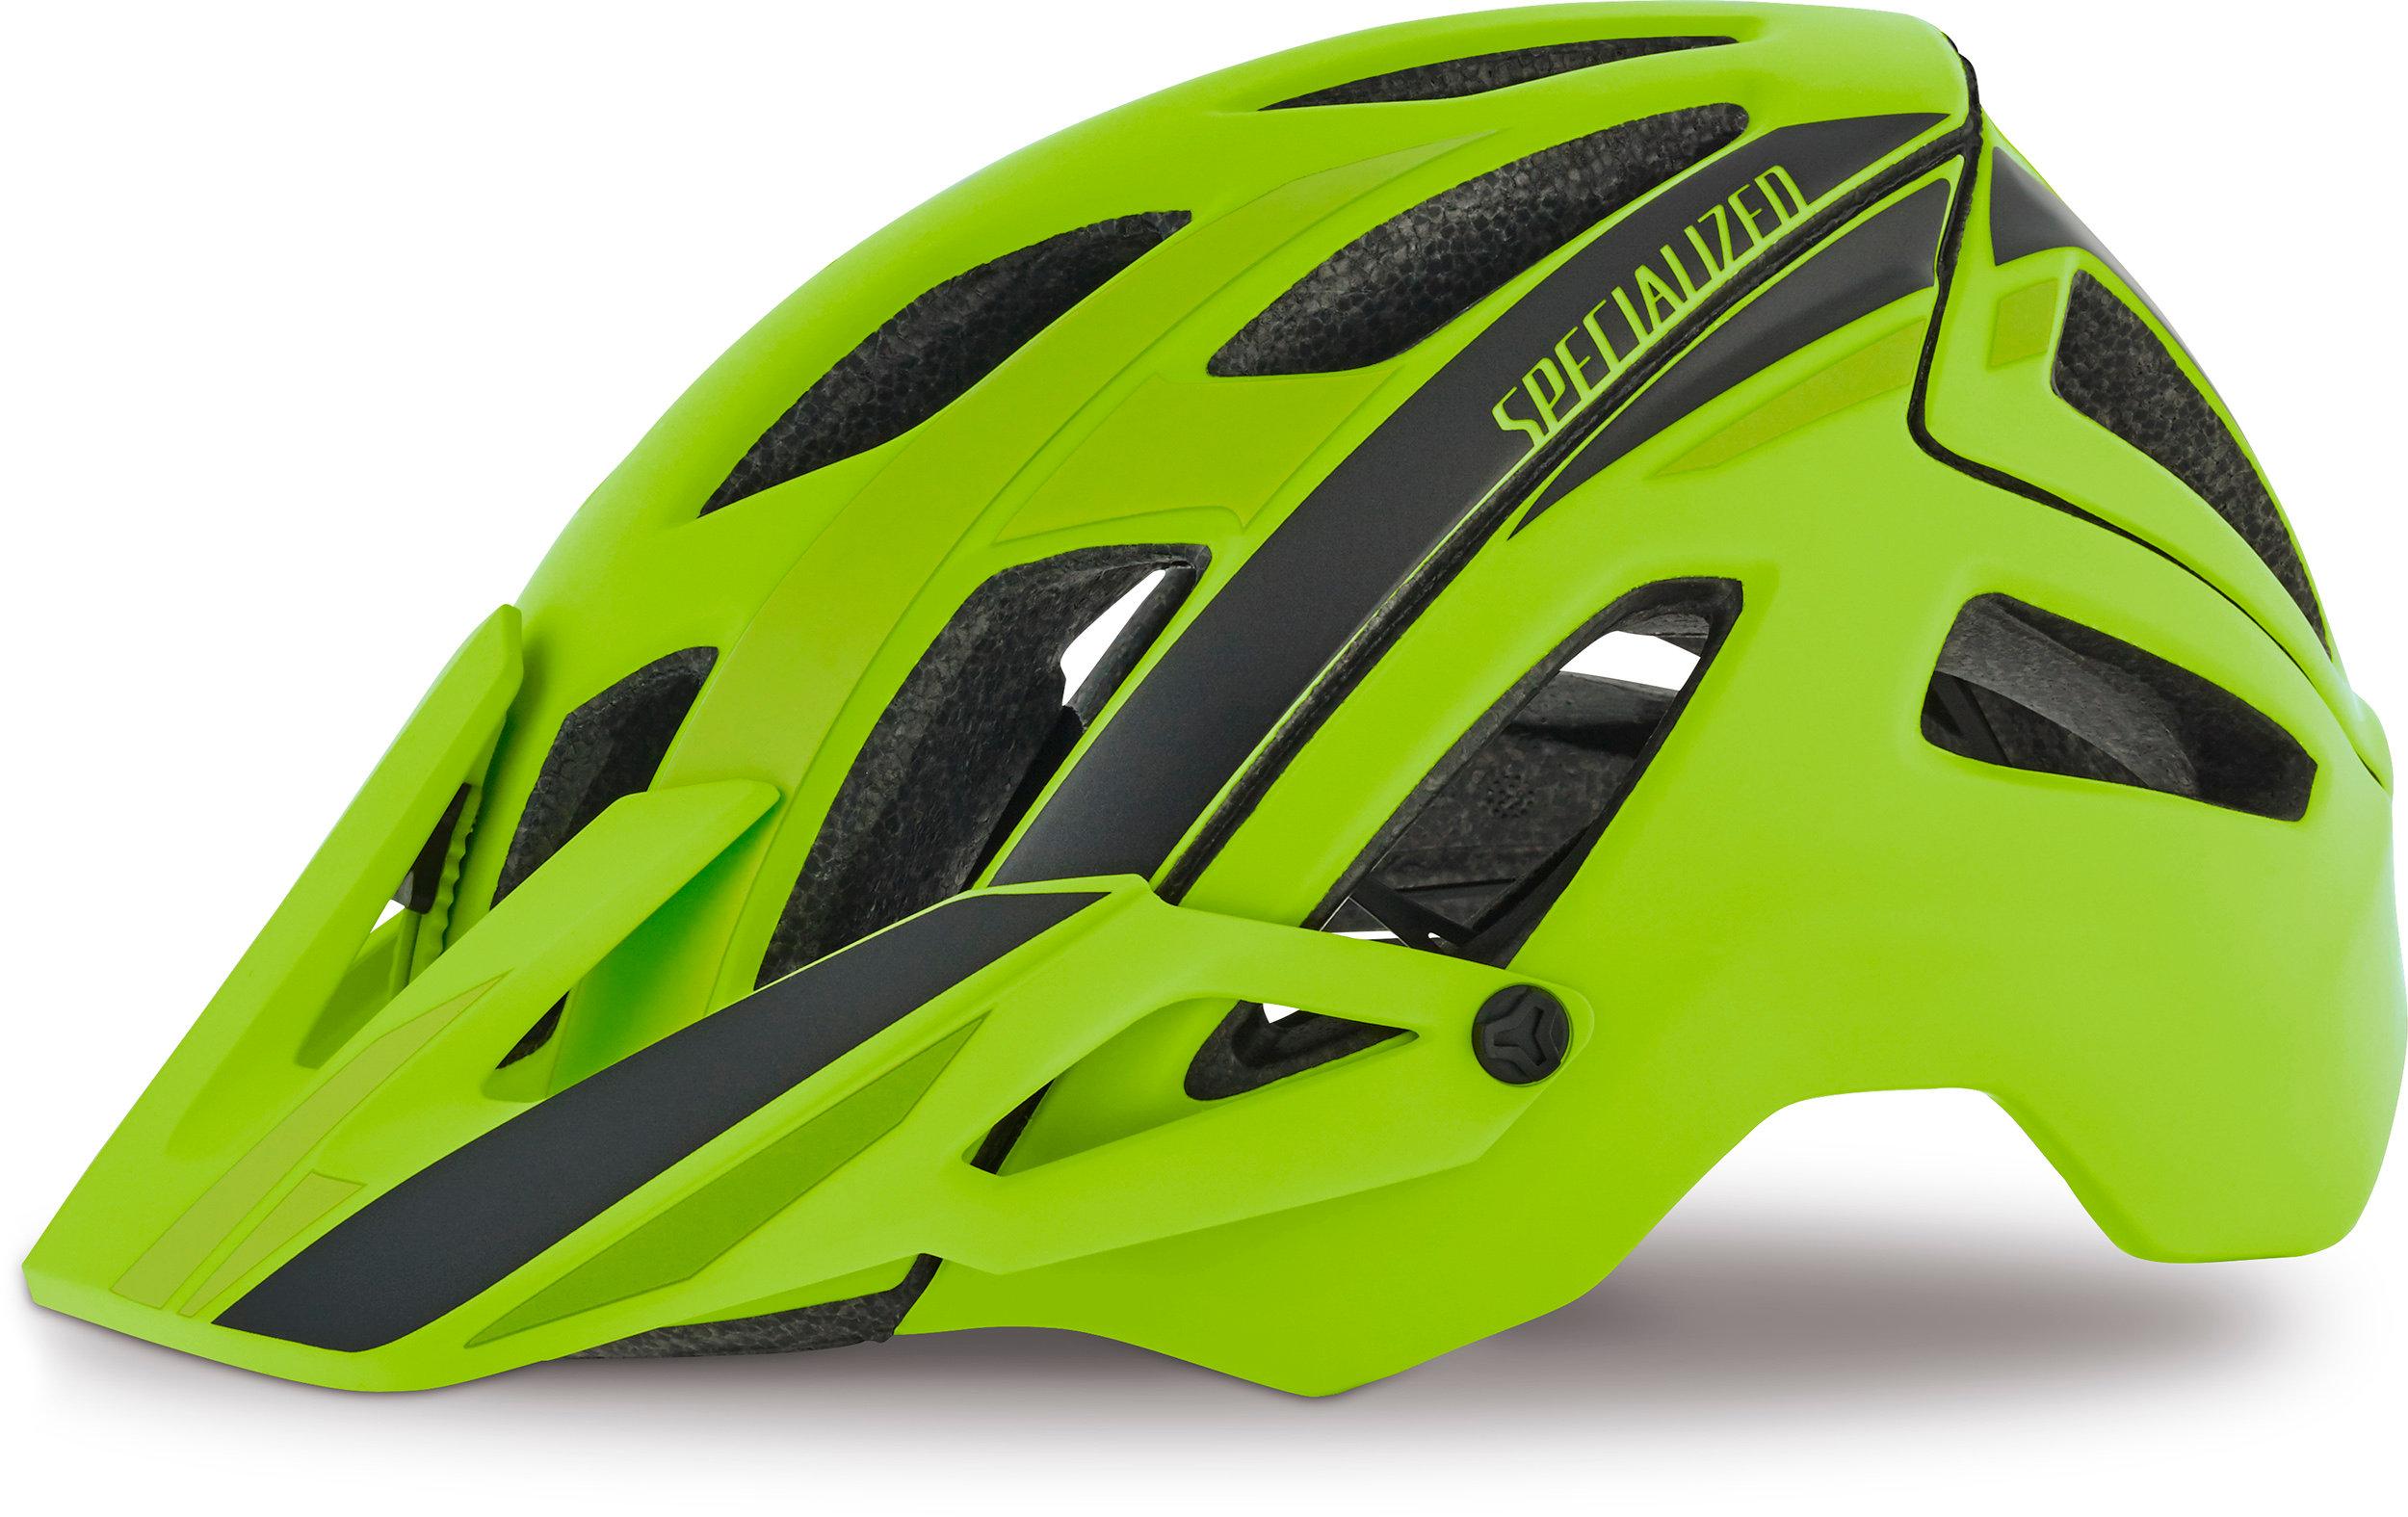 SPECIALIZED AMBUSH HLMT CE HYP GRN/CHAR SPEED L - Pulsschlag Bike+Sport